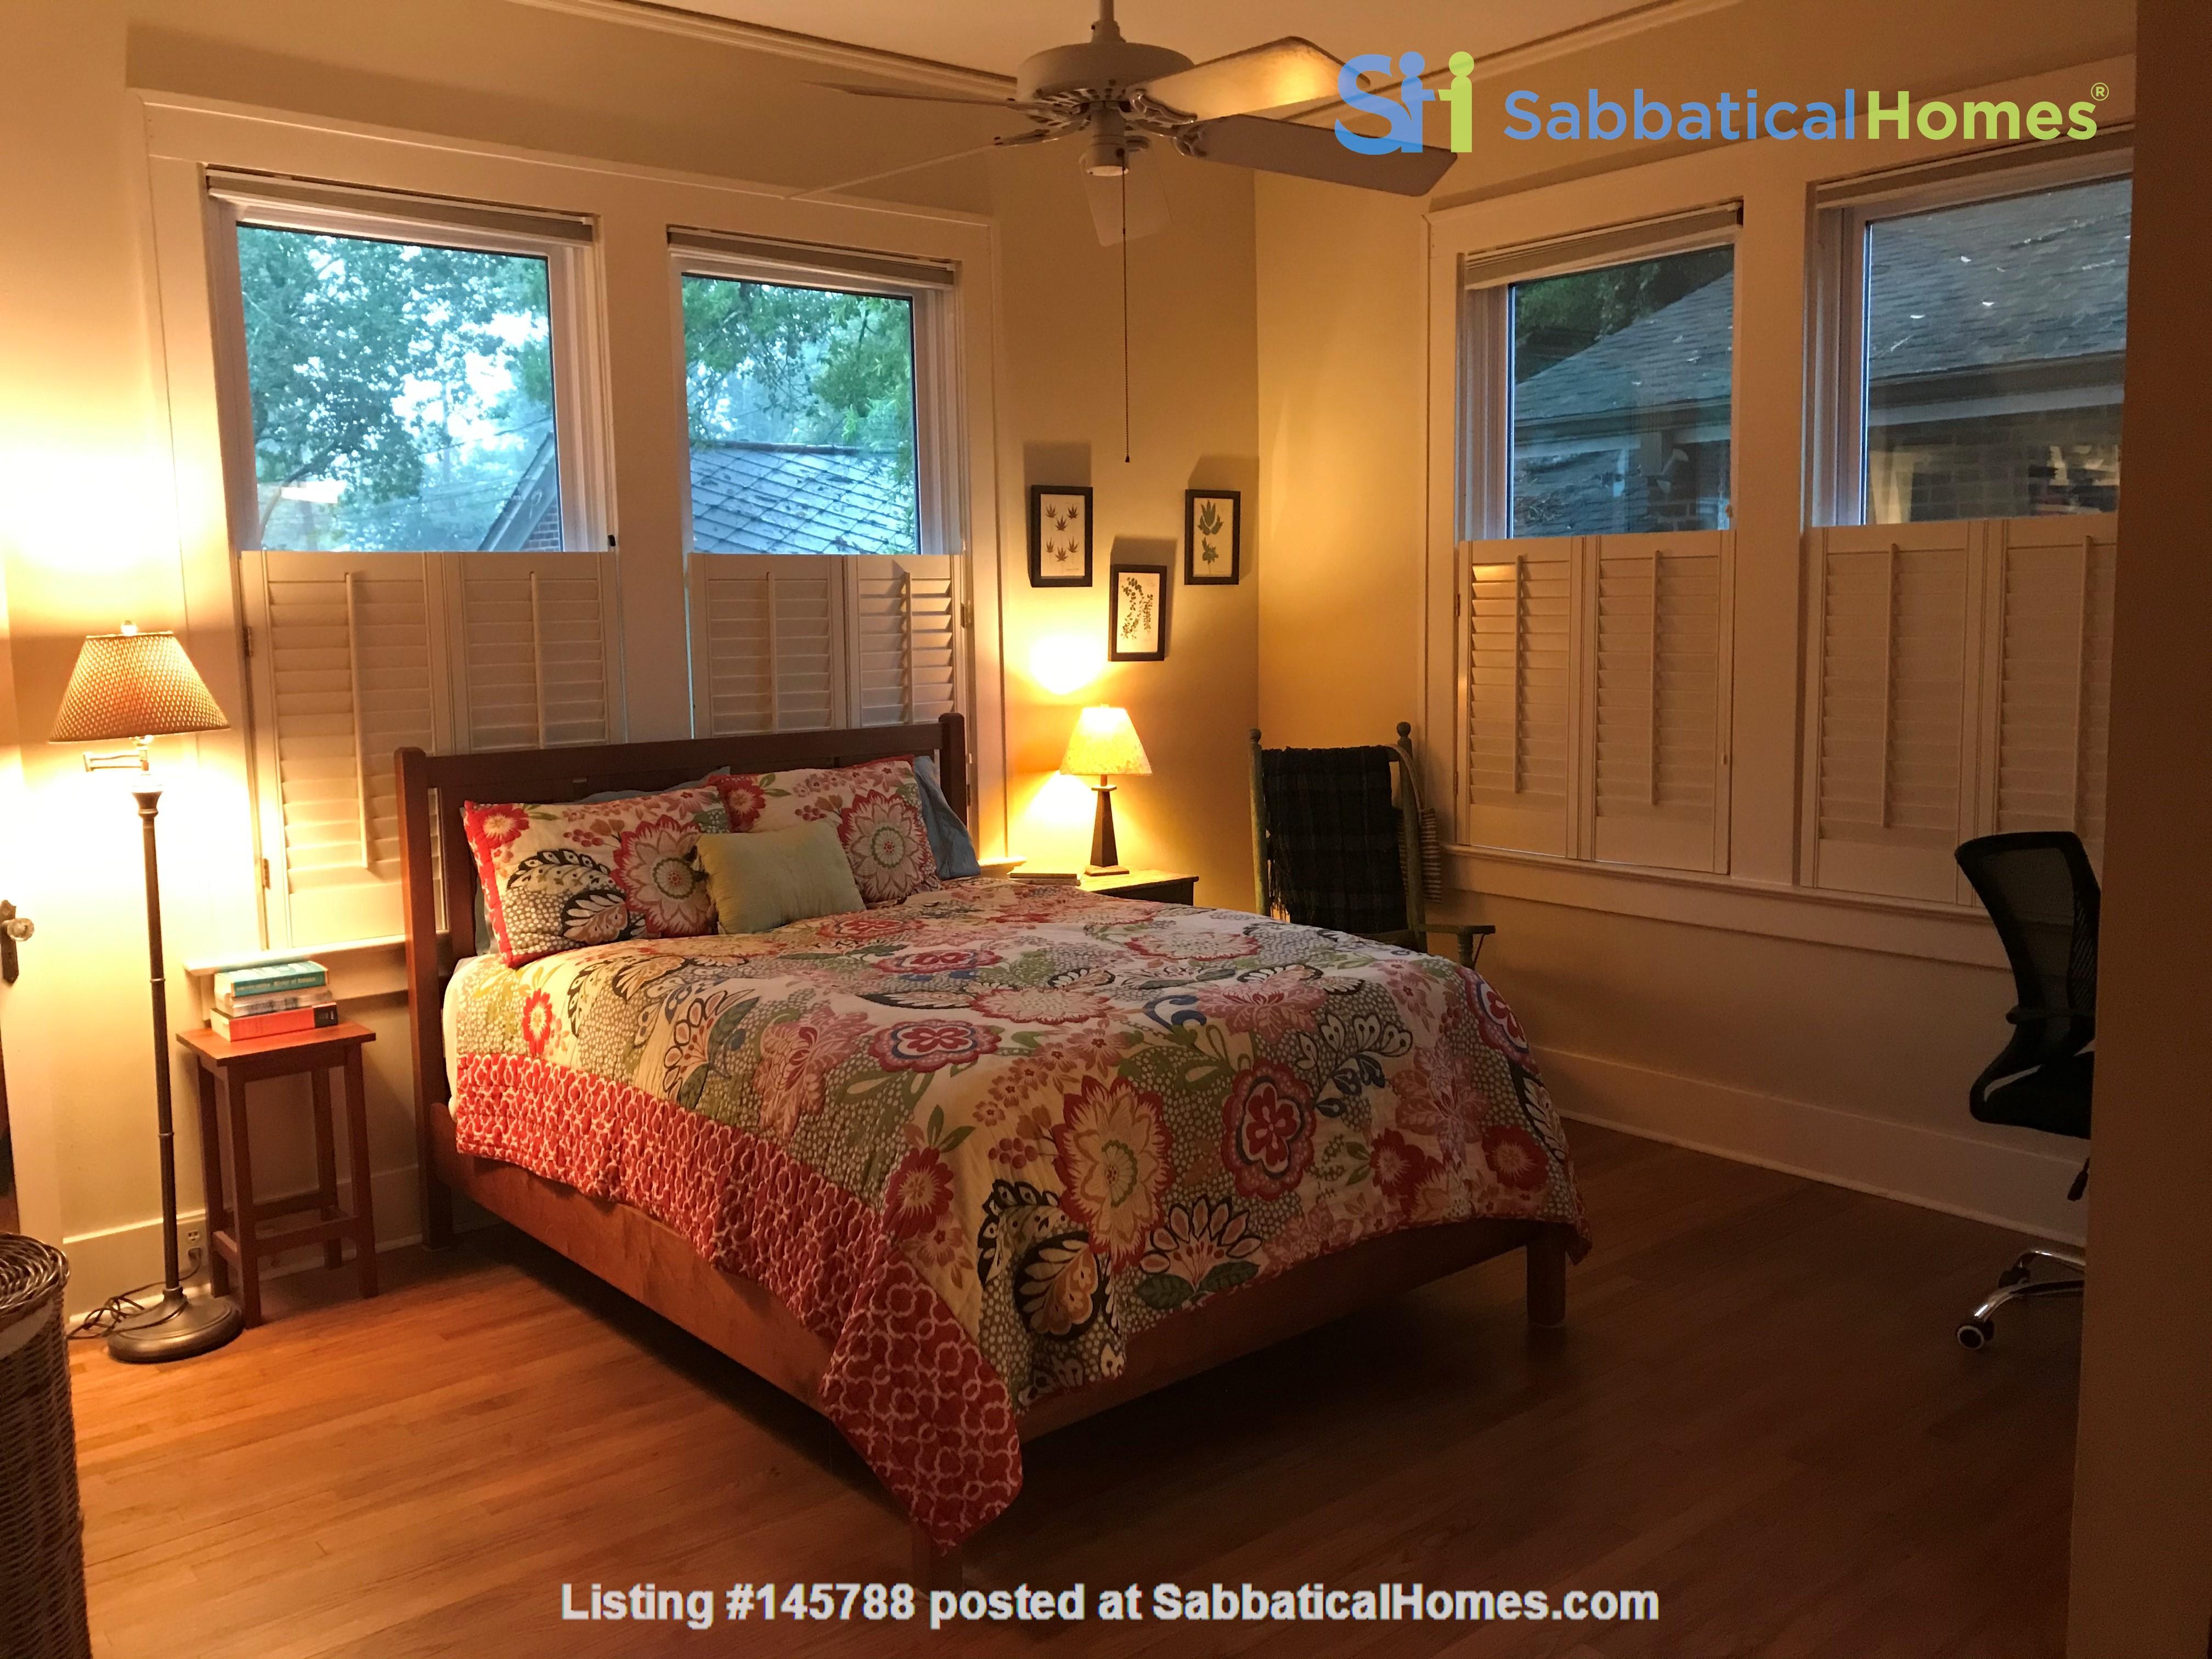 Charming 3 bedroom bungalow in Baton Rouge, Louisiana near LSU Home Rental in Baton Rouge 7